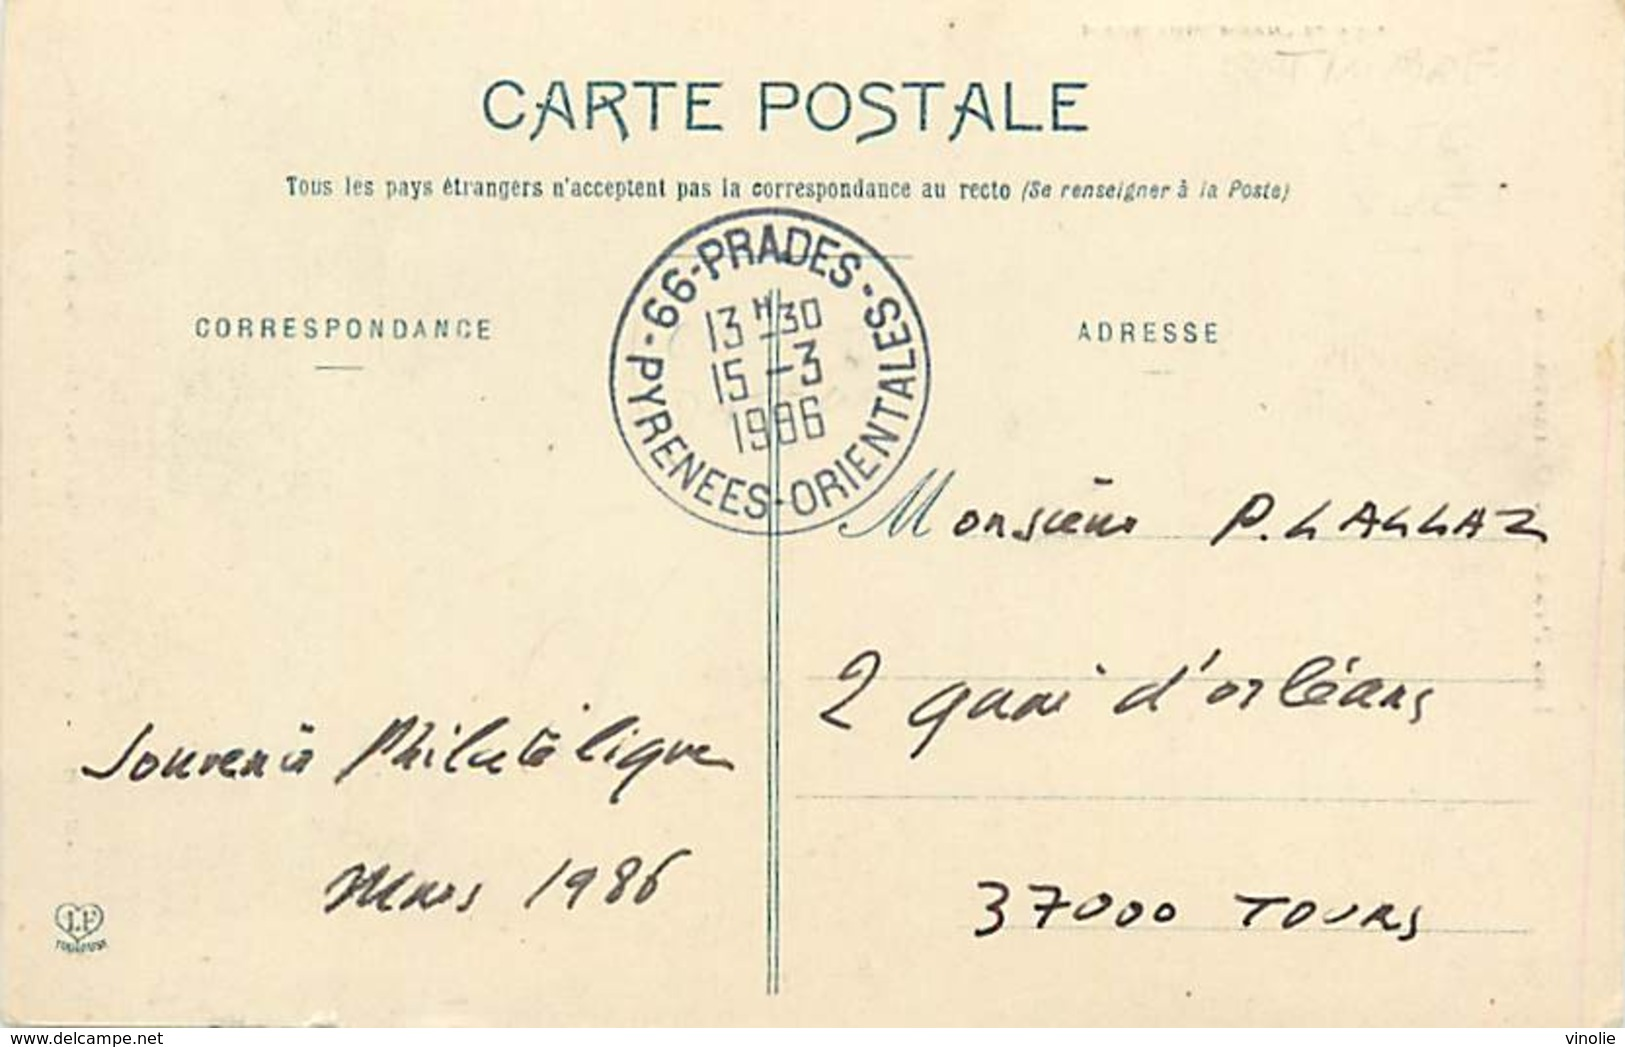 A-17 5108 : SAINT-MICHEL-DE-CUXA PRES PRADES PYRENNEES-ORIENTALES 15 MARS 1896 - 1980-89